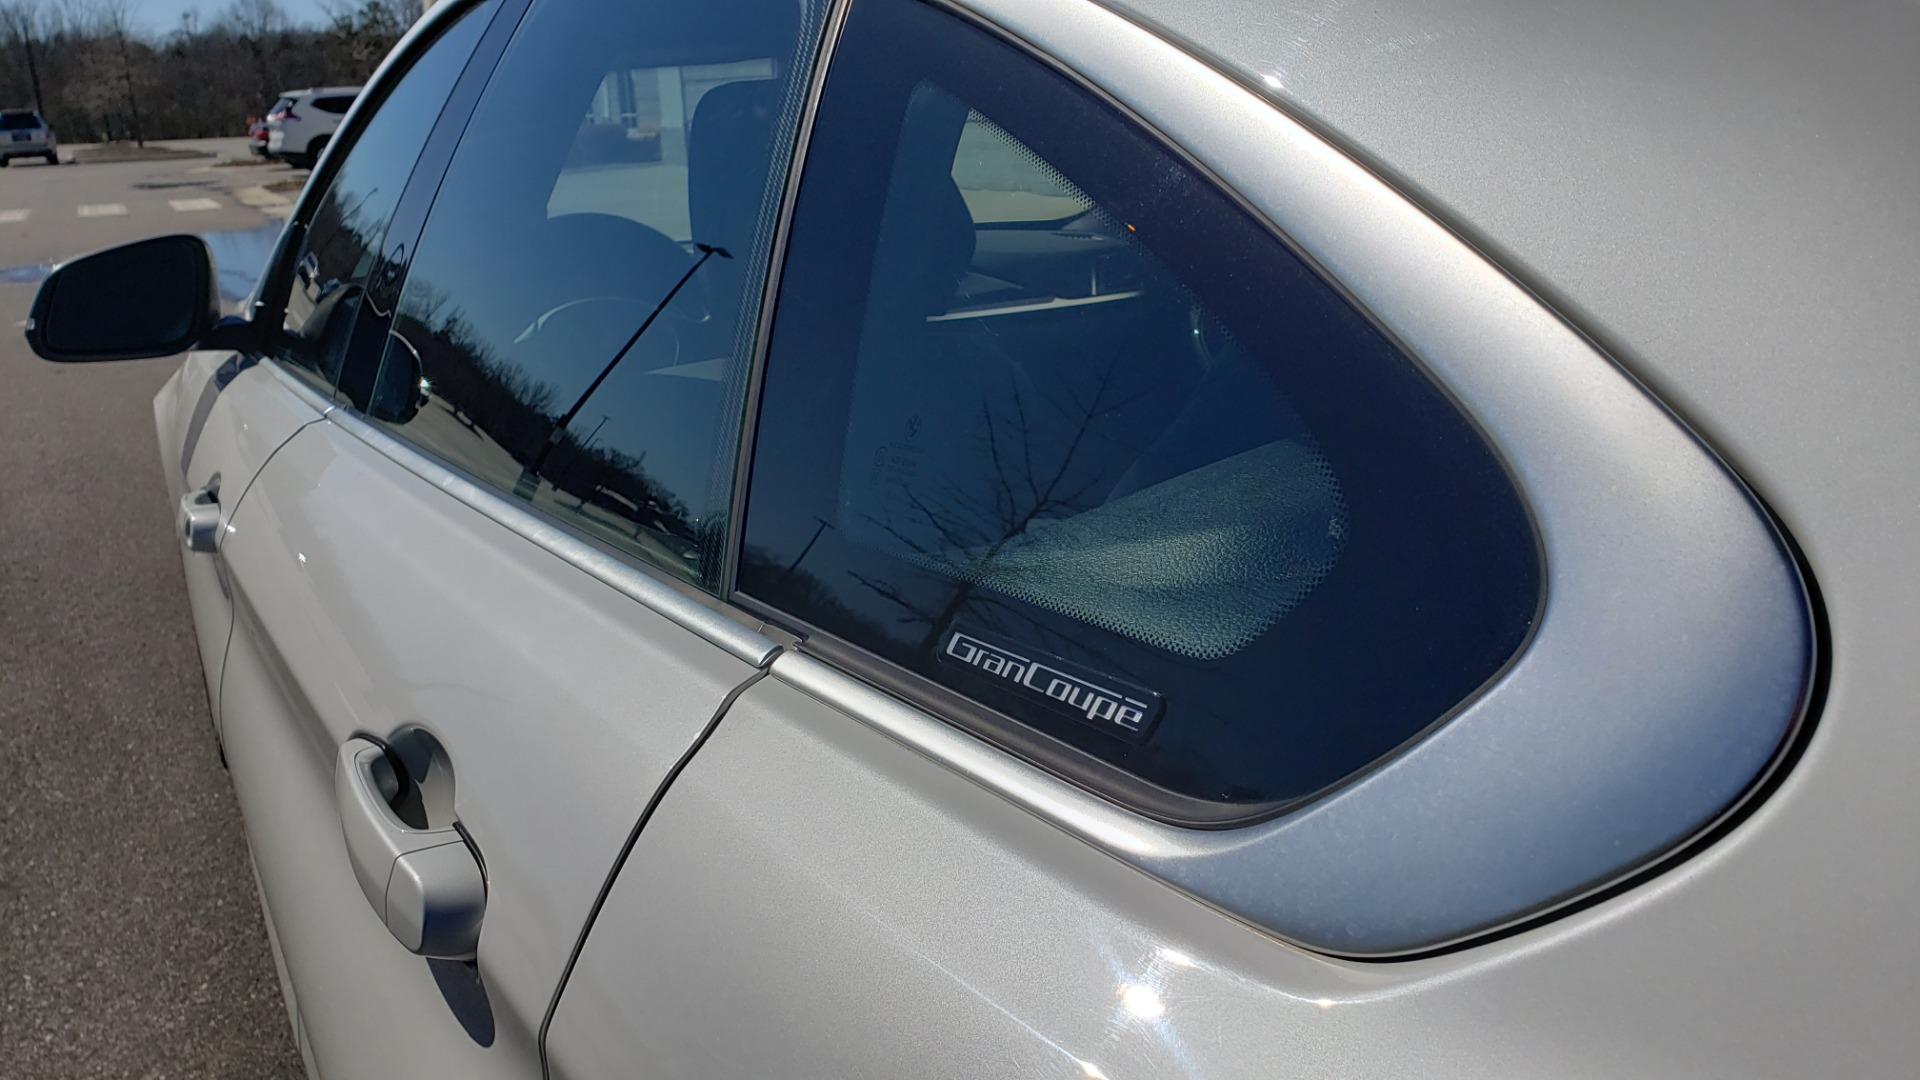 Used 2018 BMW 4 SERIES 430IXDRIVE / PREMIUM / NAV / SUNROOF / ESSENTIALS PKG for sale $28,995 at Formula Imports in Charlotte NC 28227 10